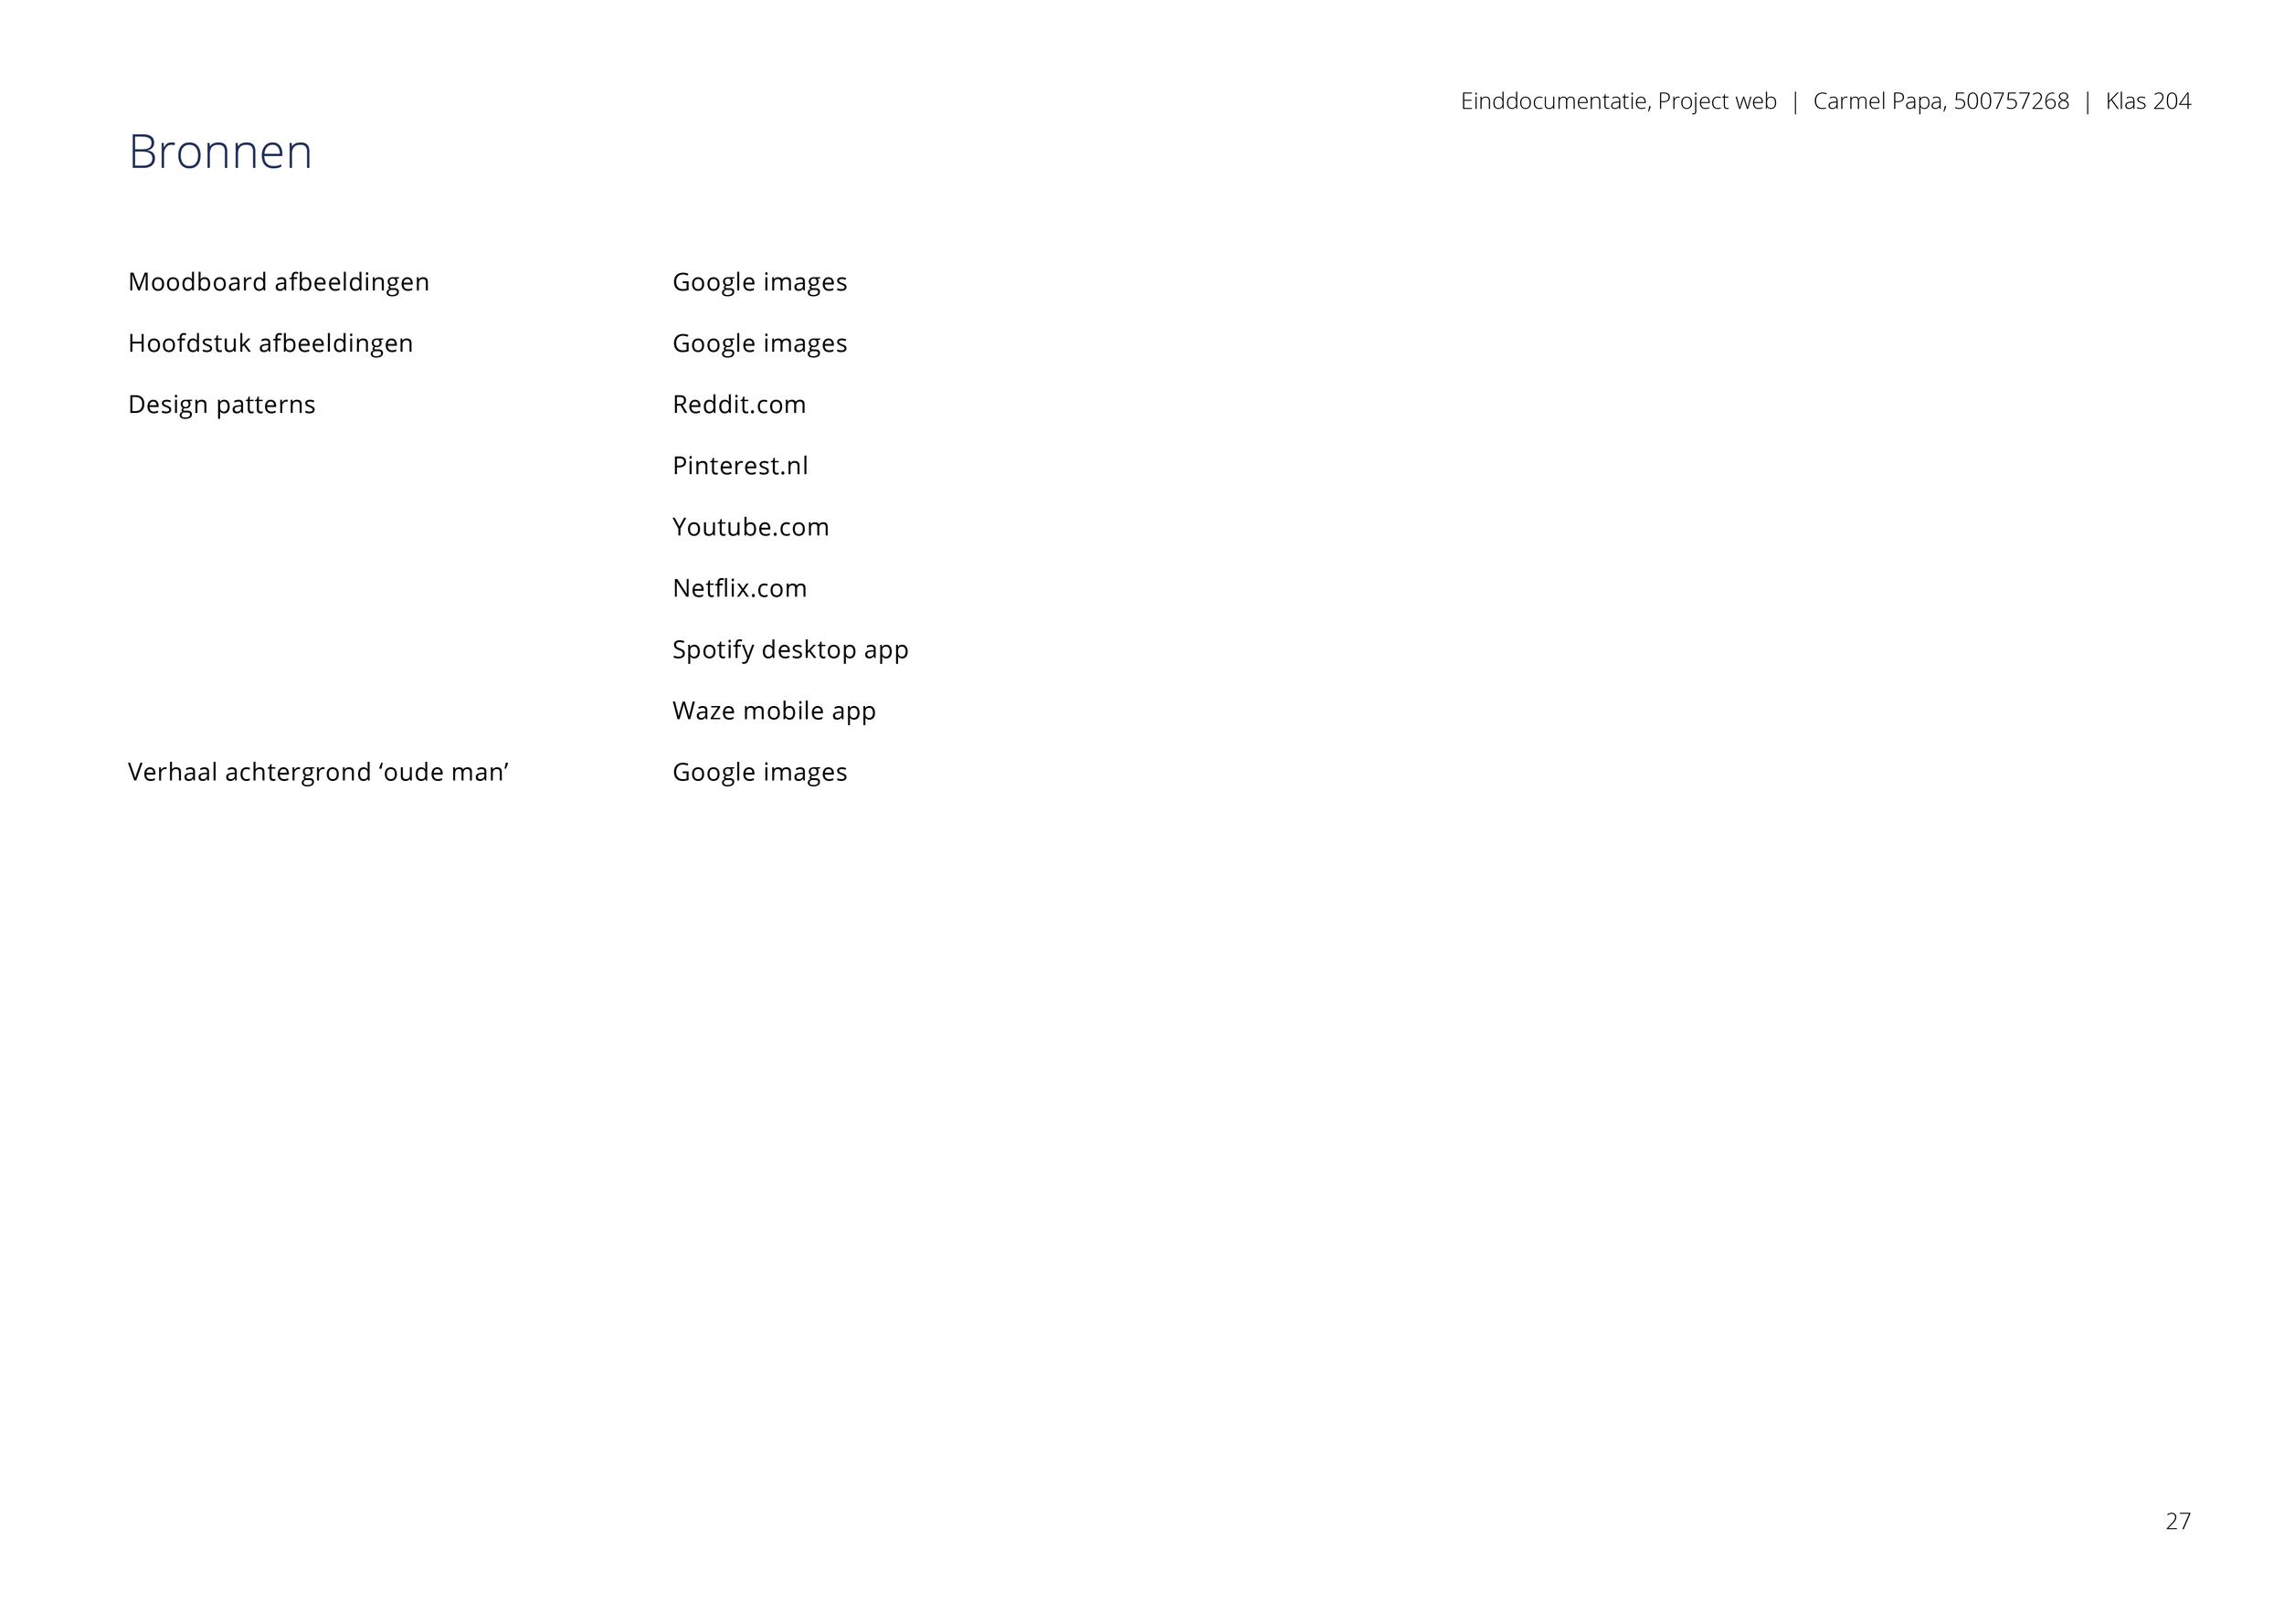 Einddocument_Project Web_Carmel Papa_204_Bronnen.png